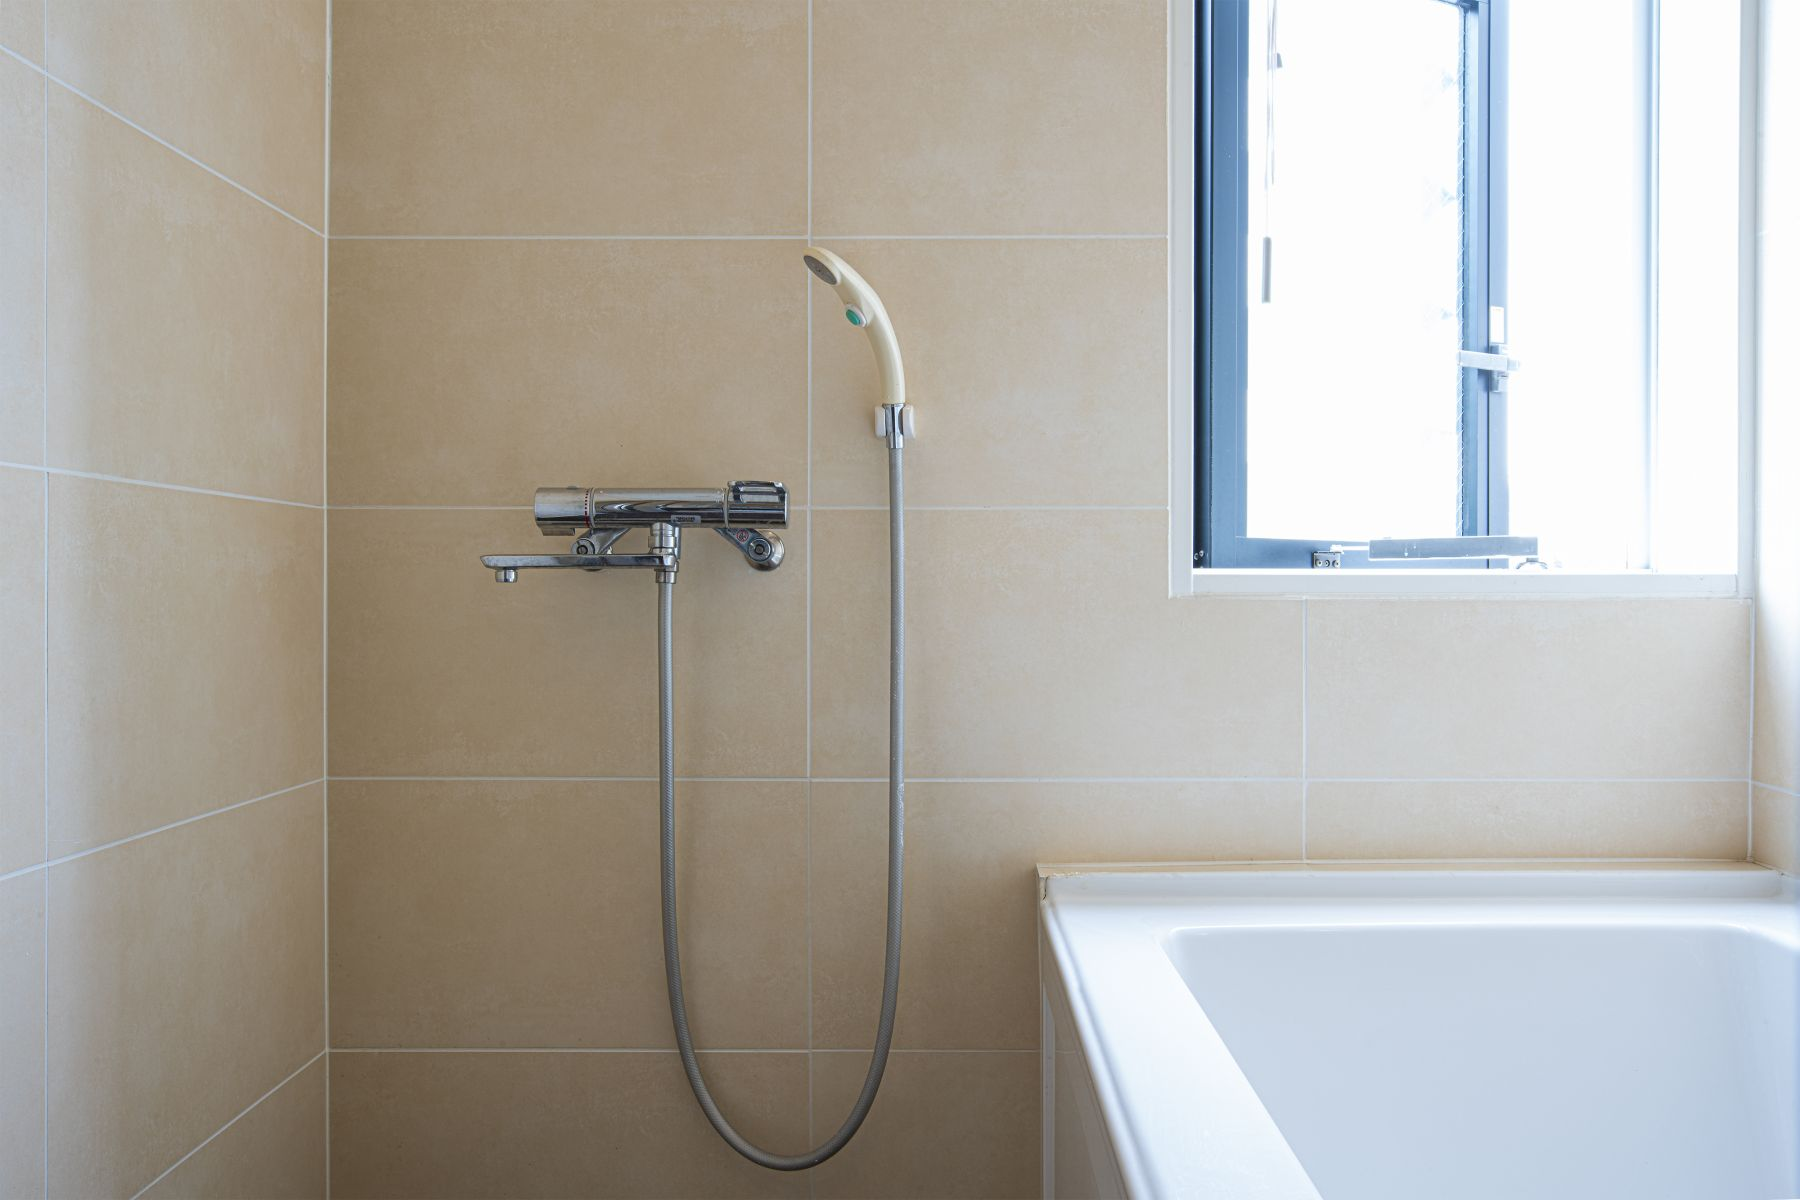 Studio TERRANOVA Dst  キッチン+バルコニー  (スタジオテラノヴァ)【Option】浴室・洗面所